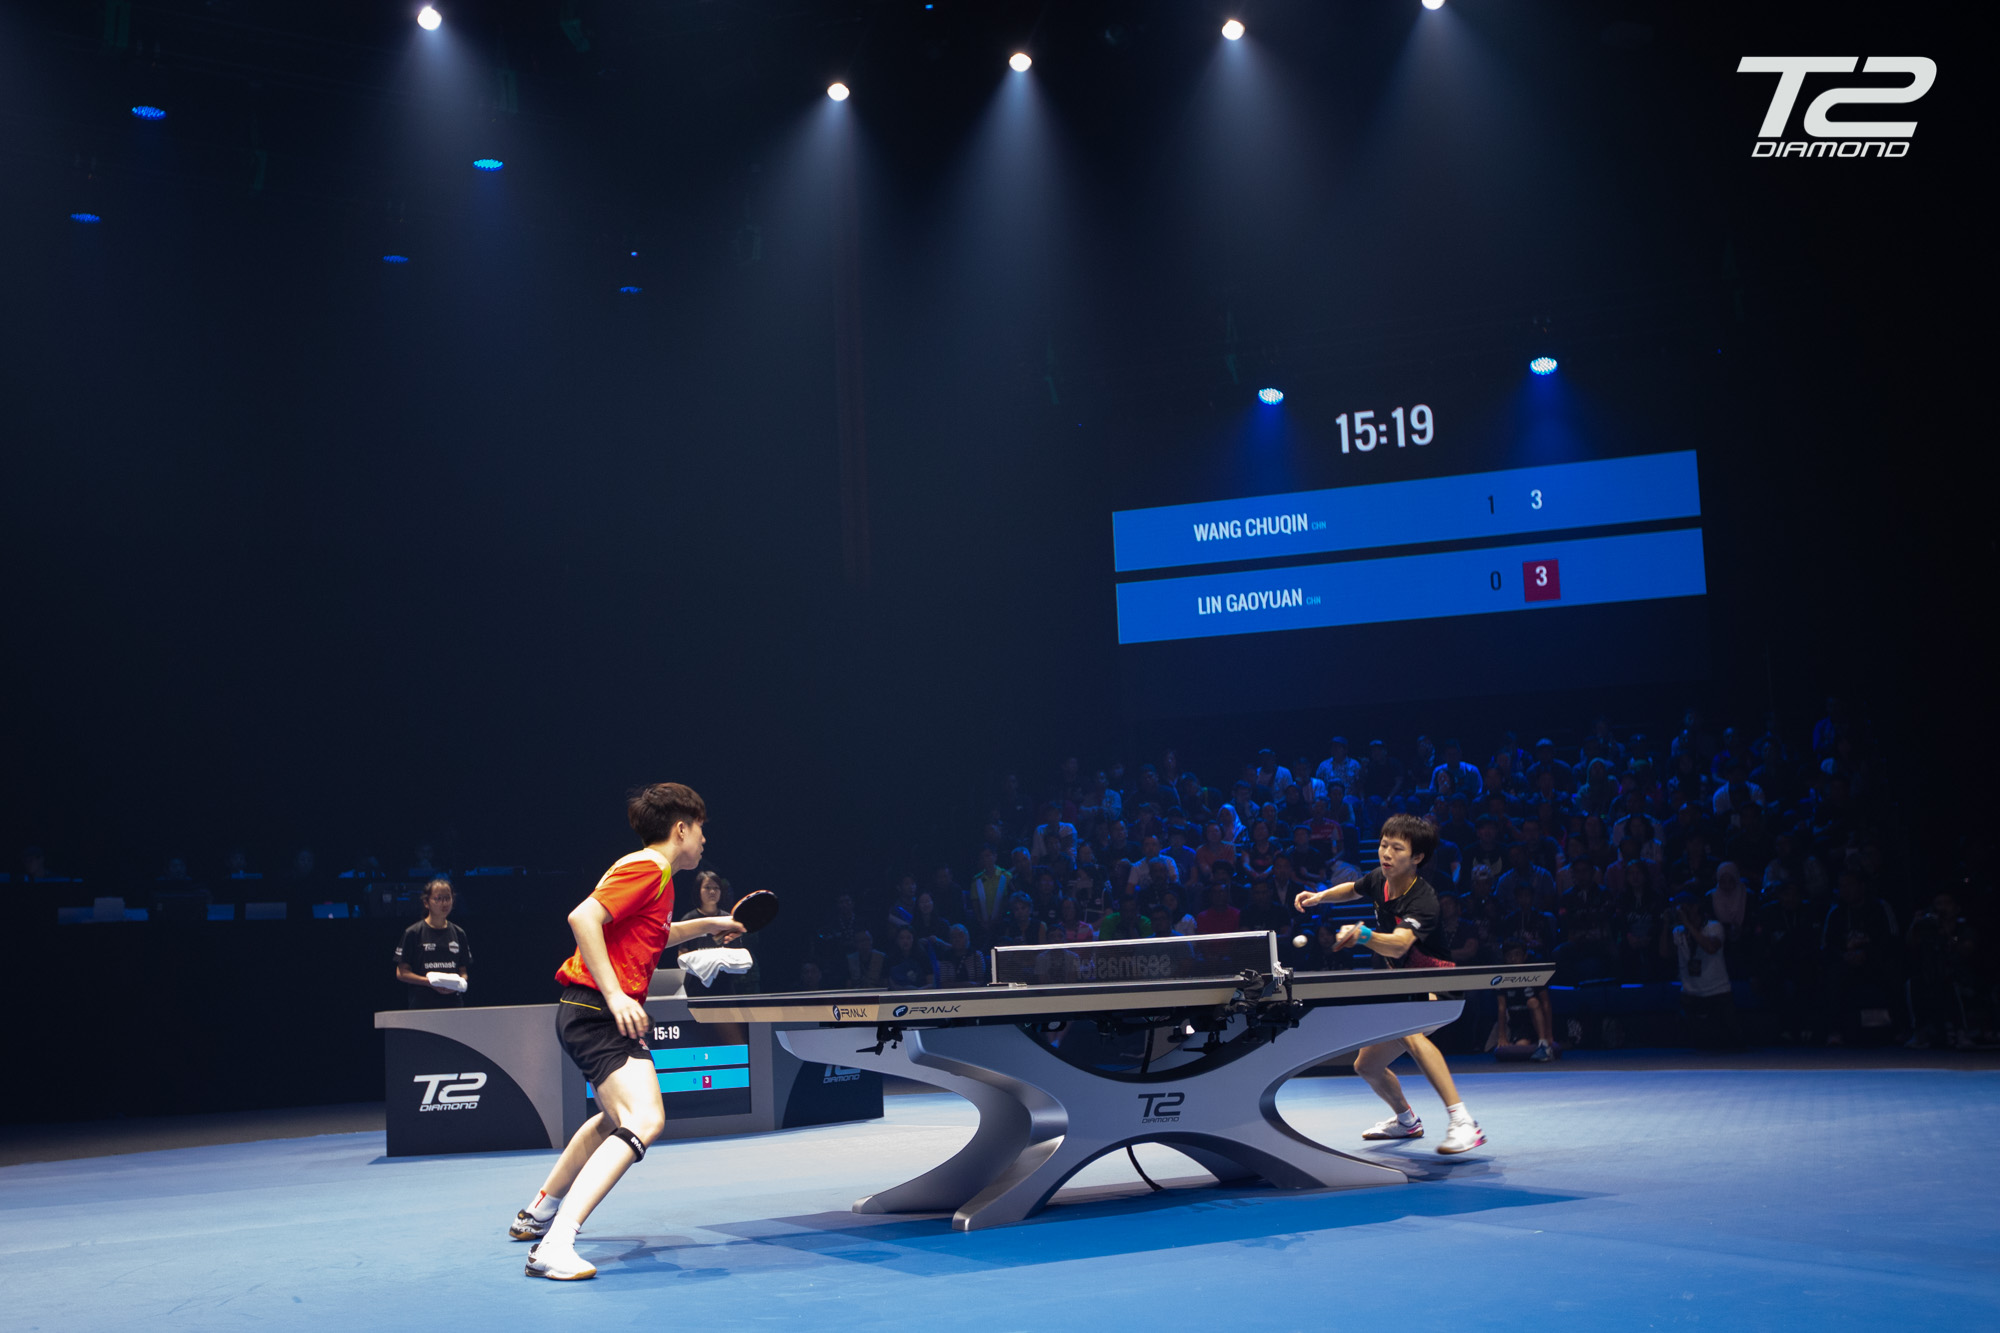 20190718_Match1_R16_WANGchuqin_vs_LINgaoyuan_00005_WEBRES